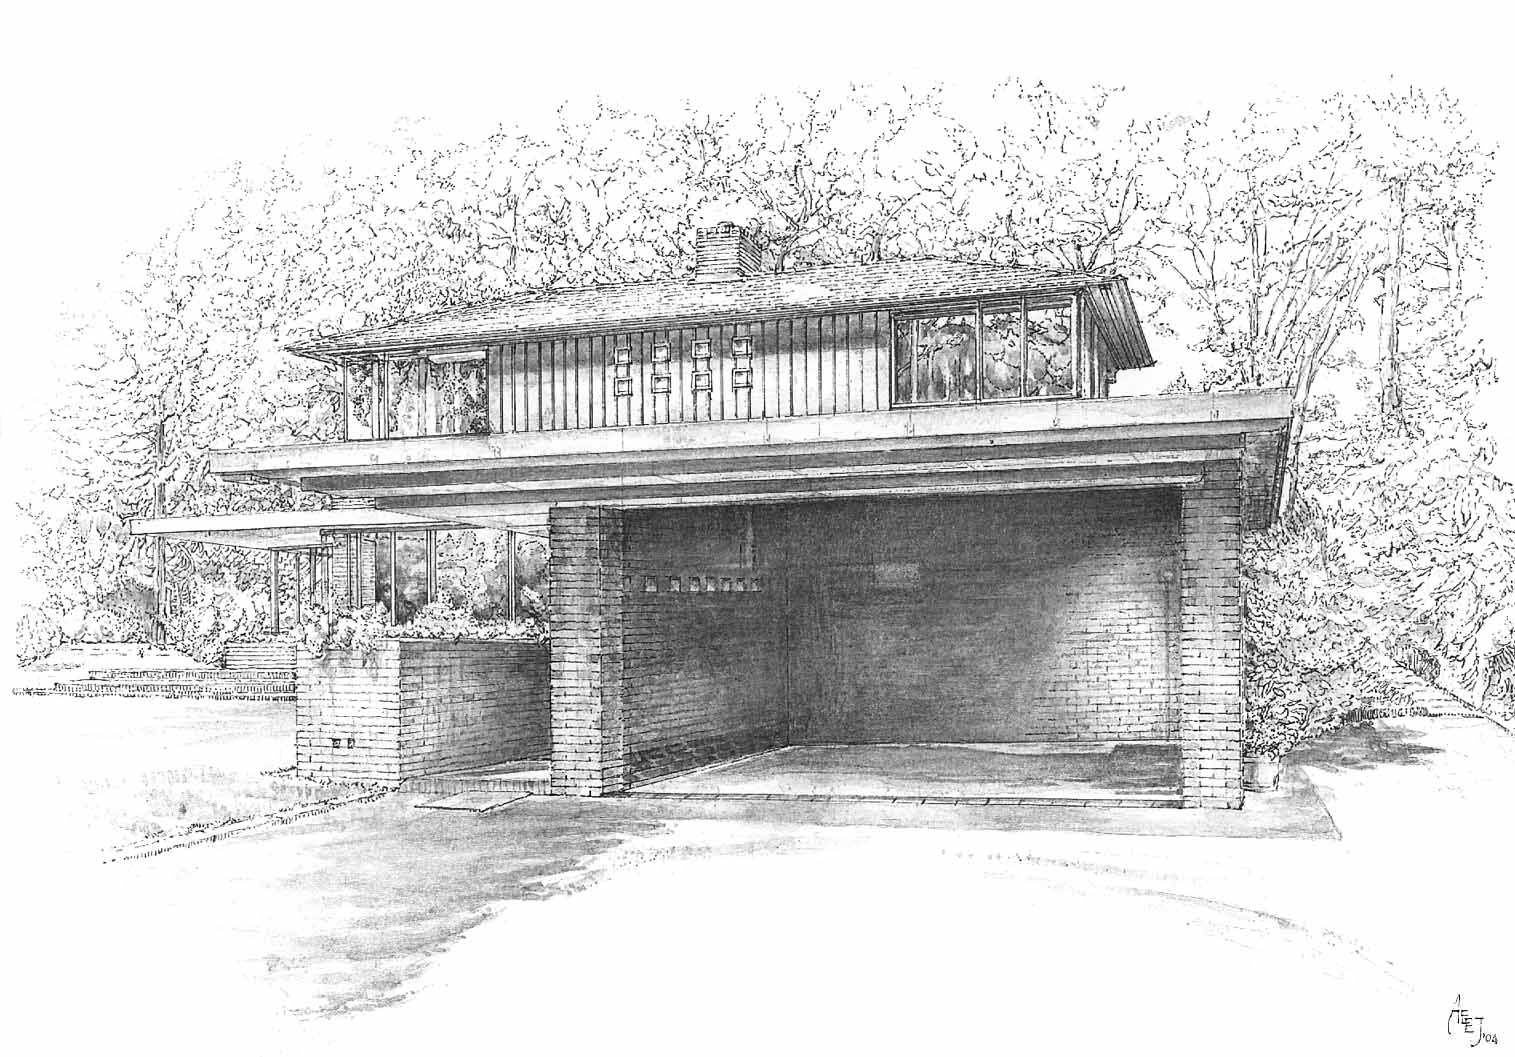 architectural drawings of buildings. Drawings Architectural Of Buildings